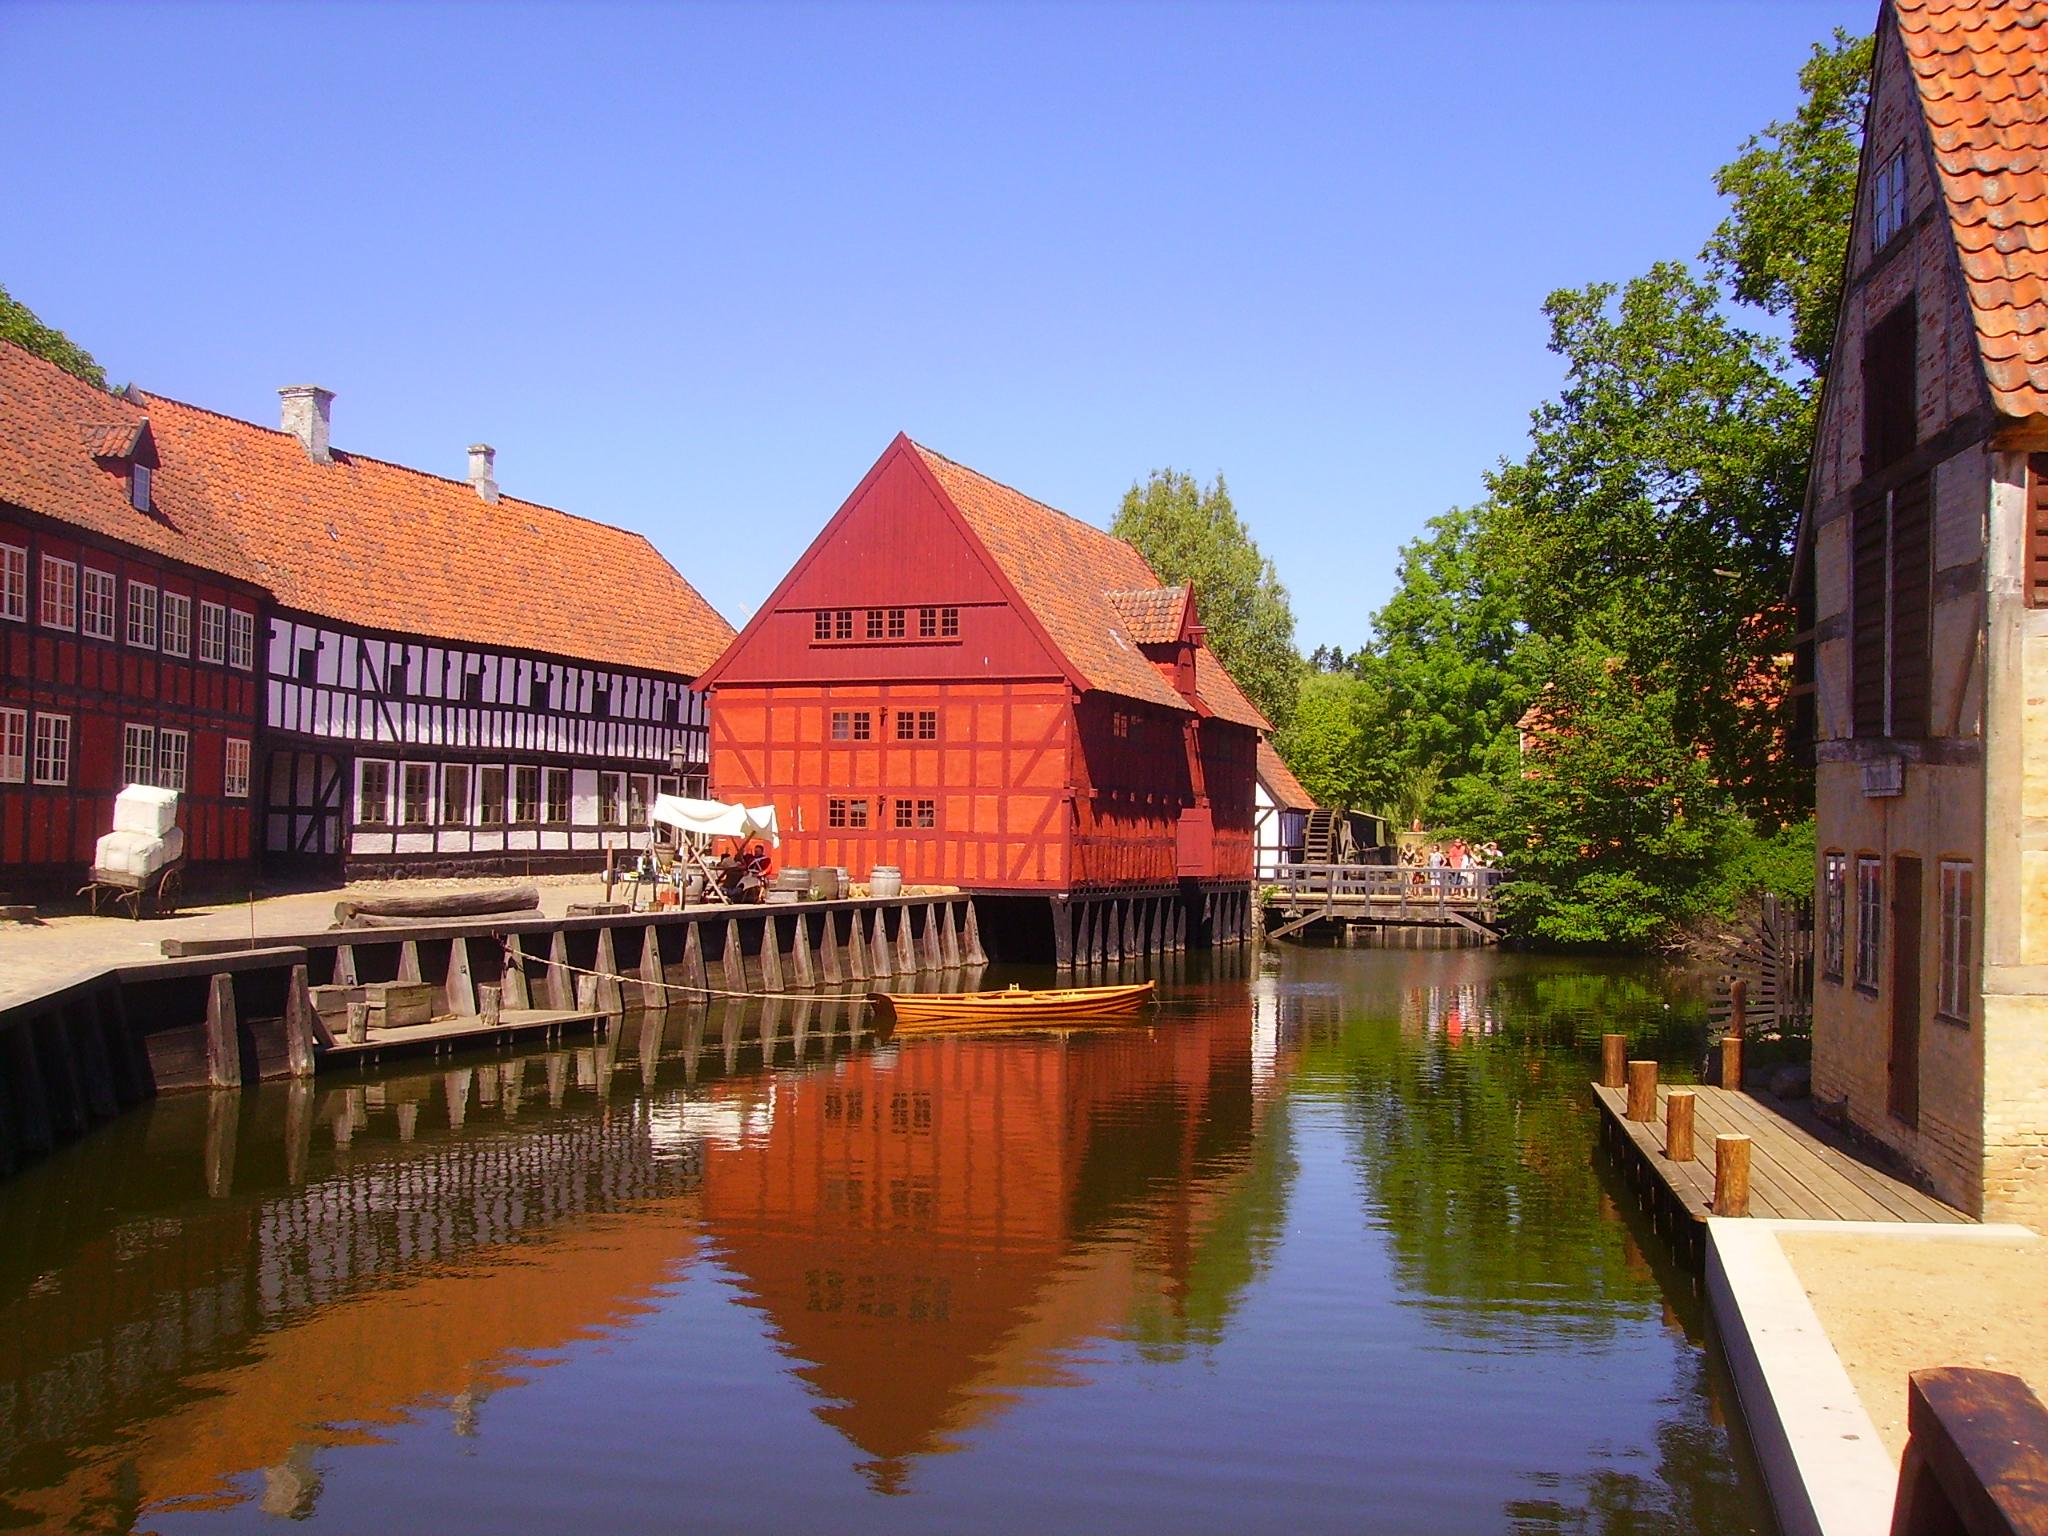 Http Commons Wikimedia Org Wiki File Aarhus Den Gamle By 17 Jpg